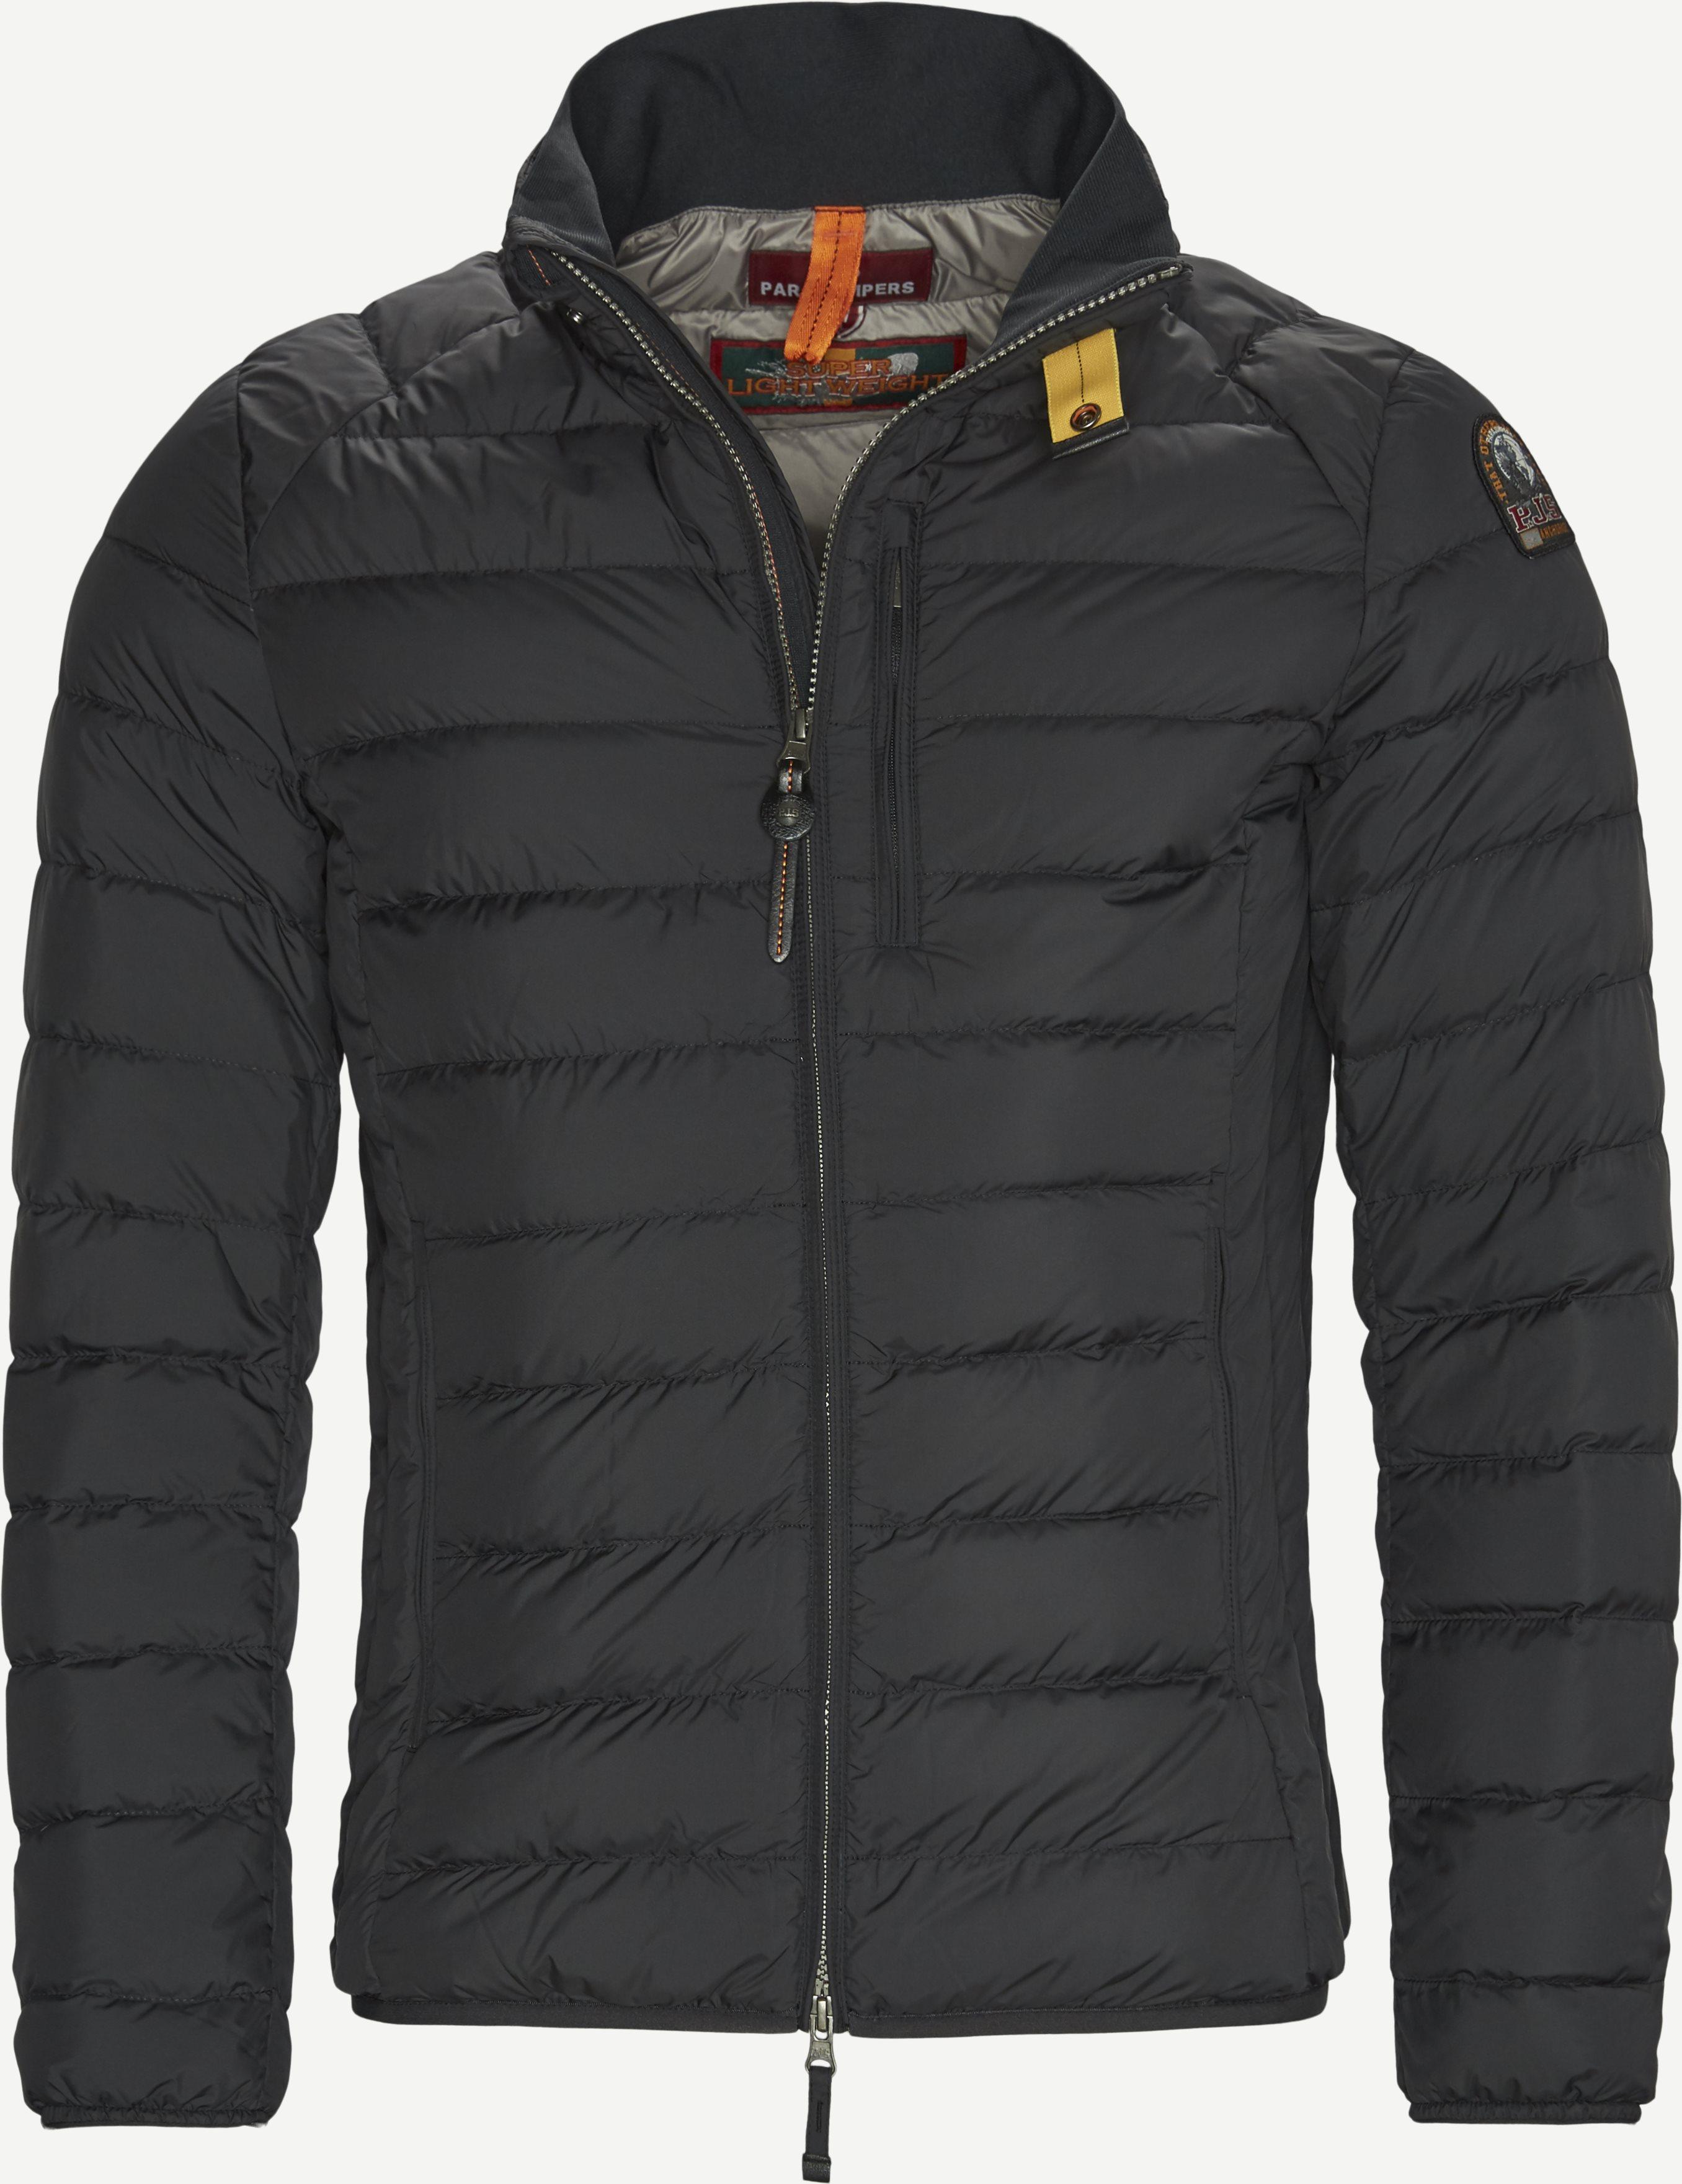 Jackets - Regular fit - Black